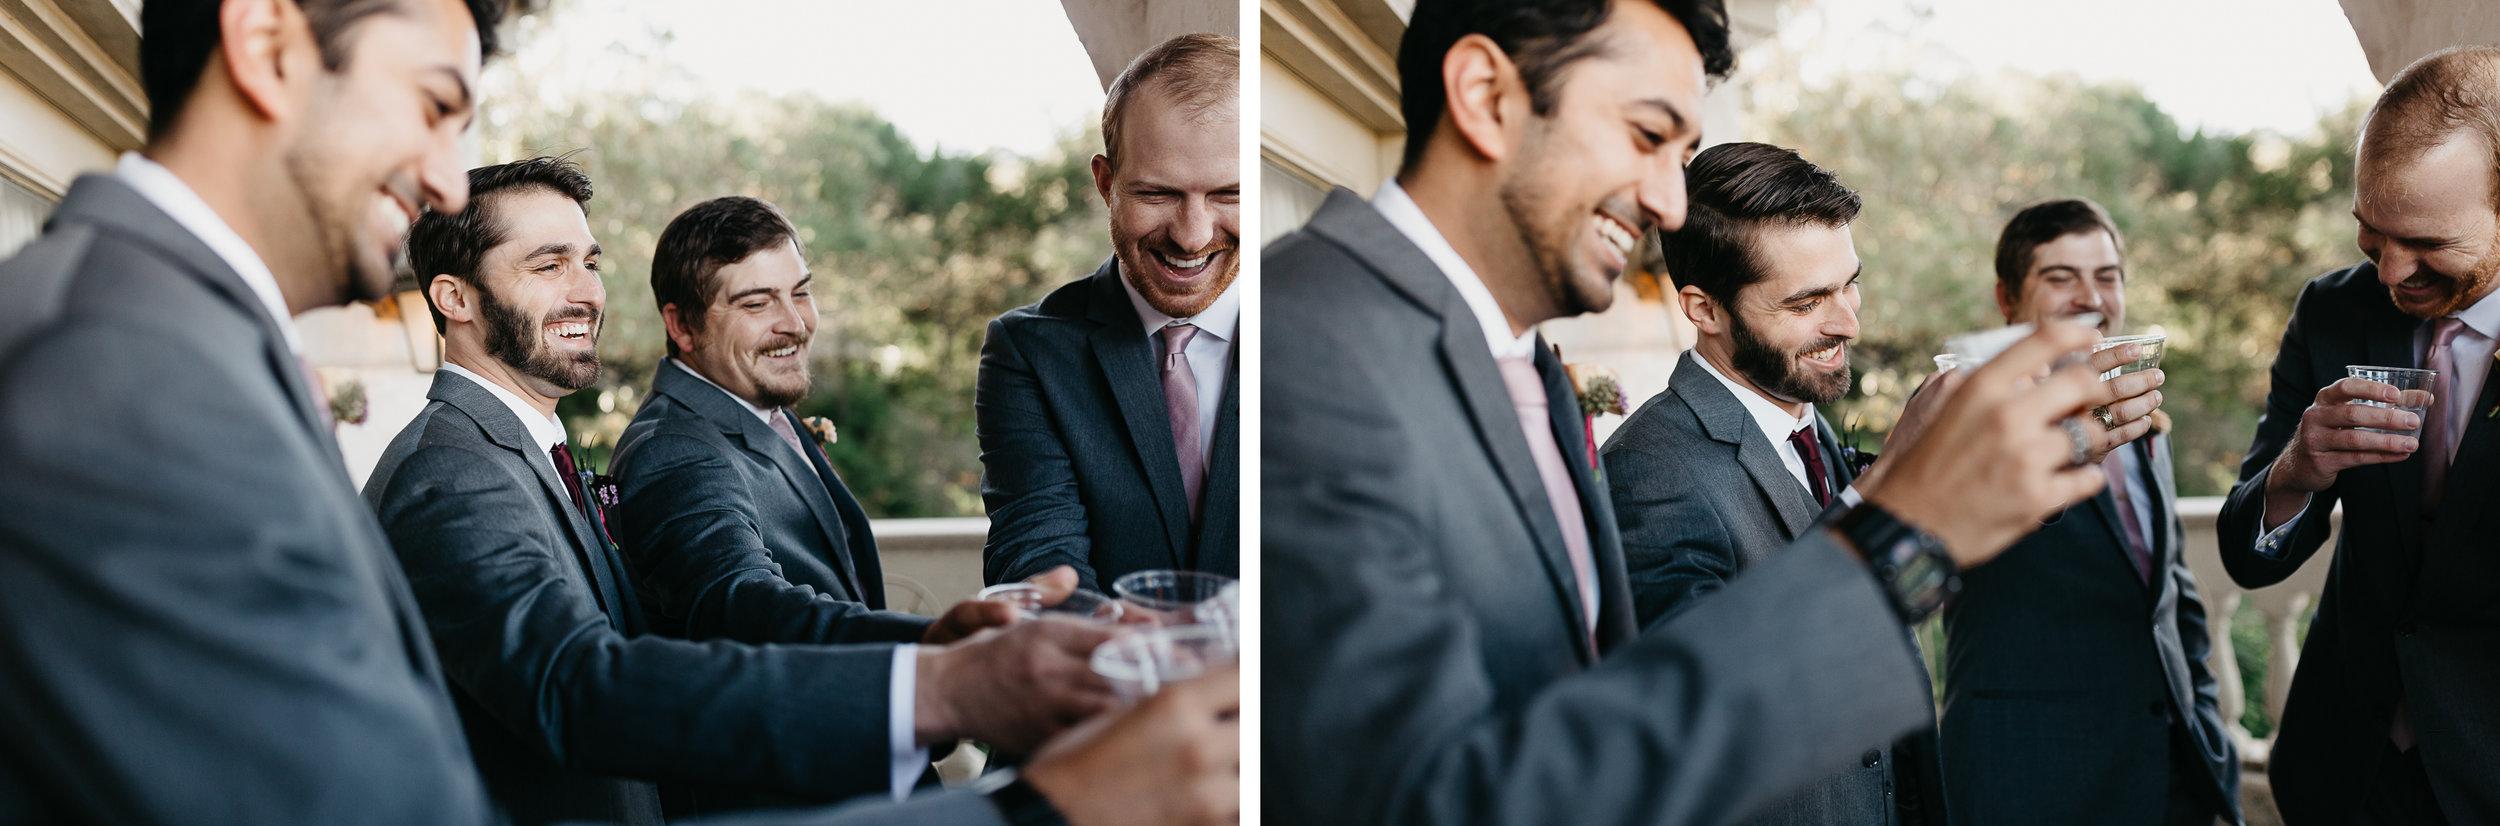 austin texas wedding photogapher elopement photographer villa antonia austin 2.jpg